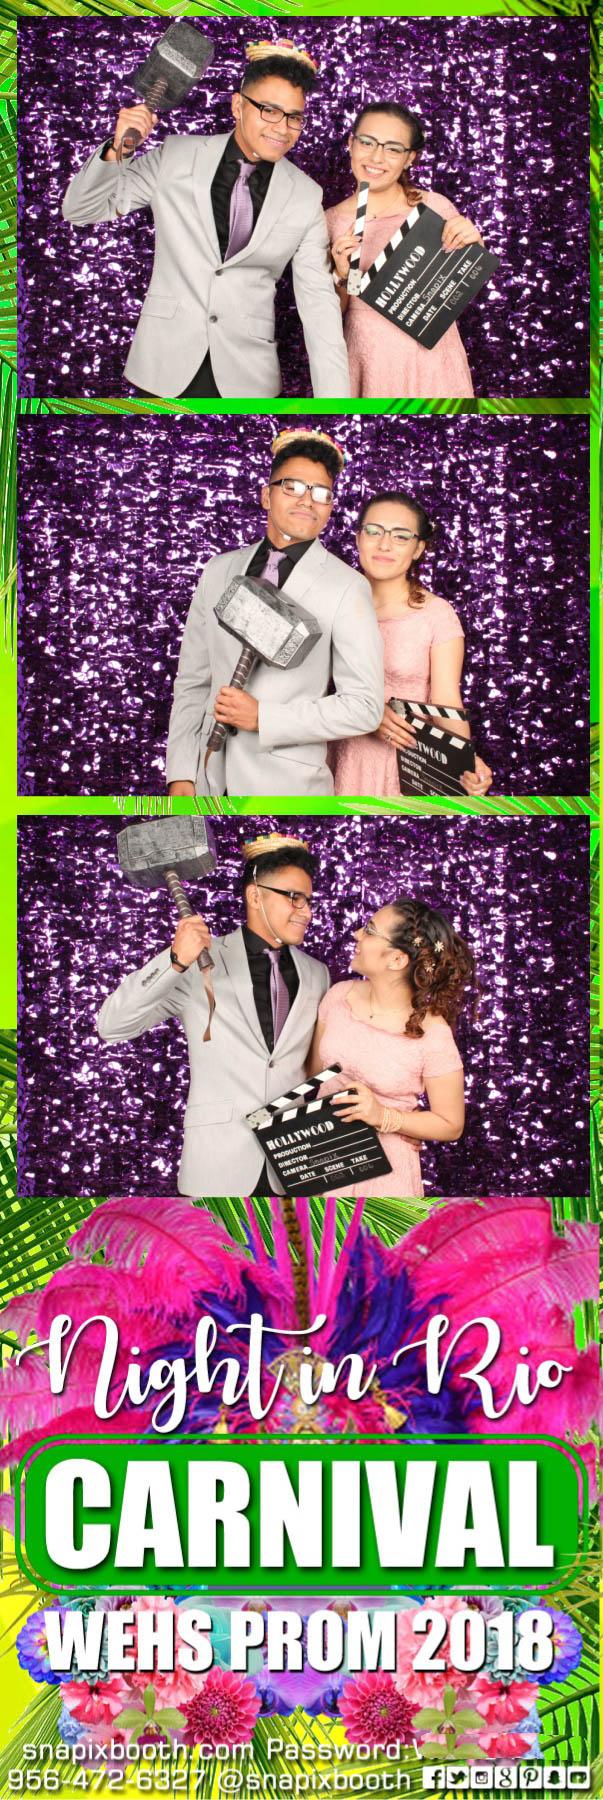 Weslaco East Prom 2018